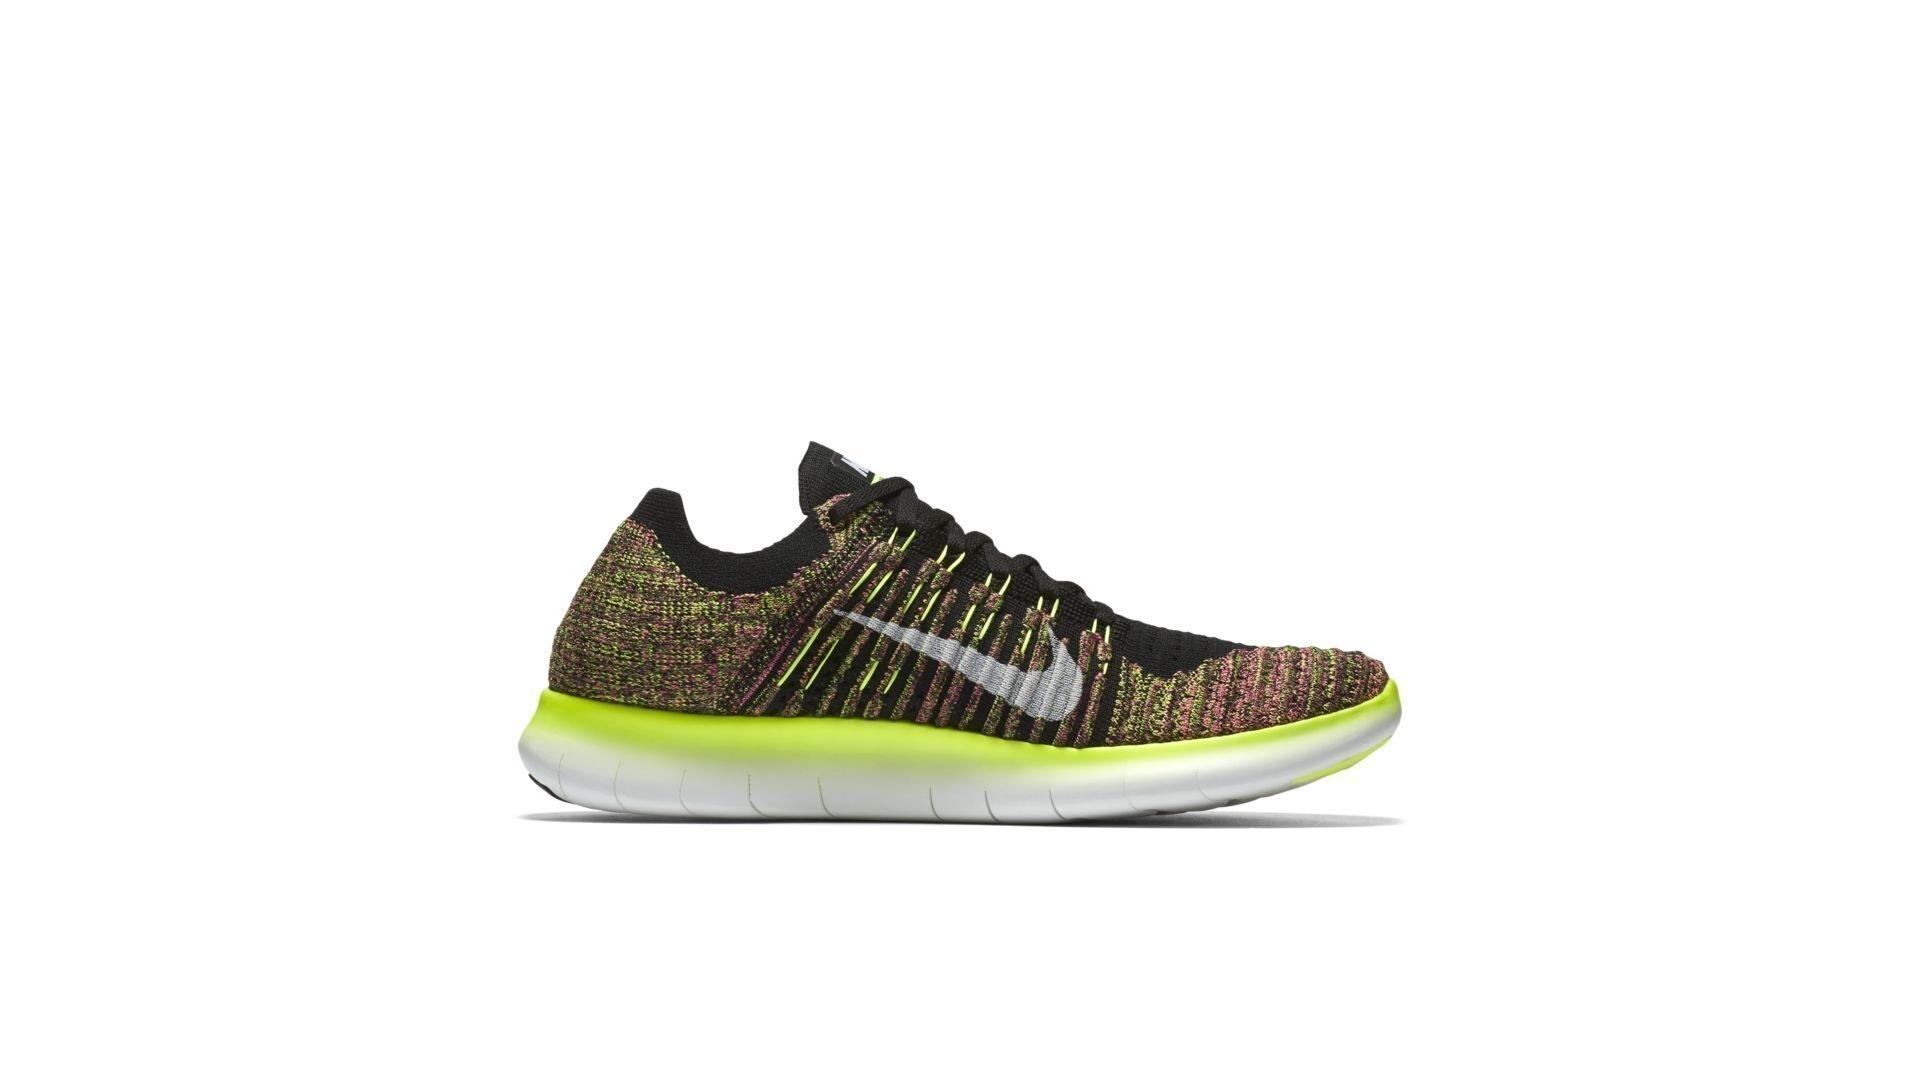 Nike Free Run Flyknit Unlimited Olympic (843430-999)